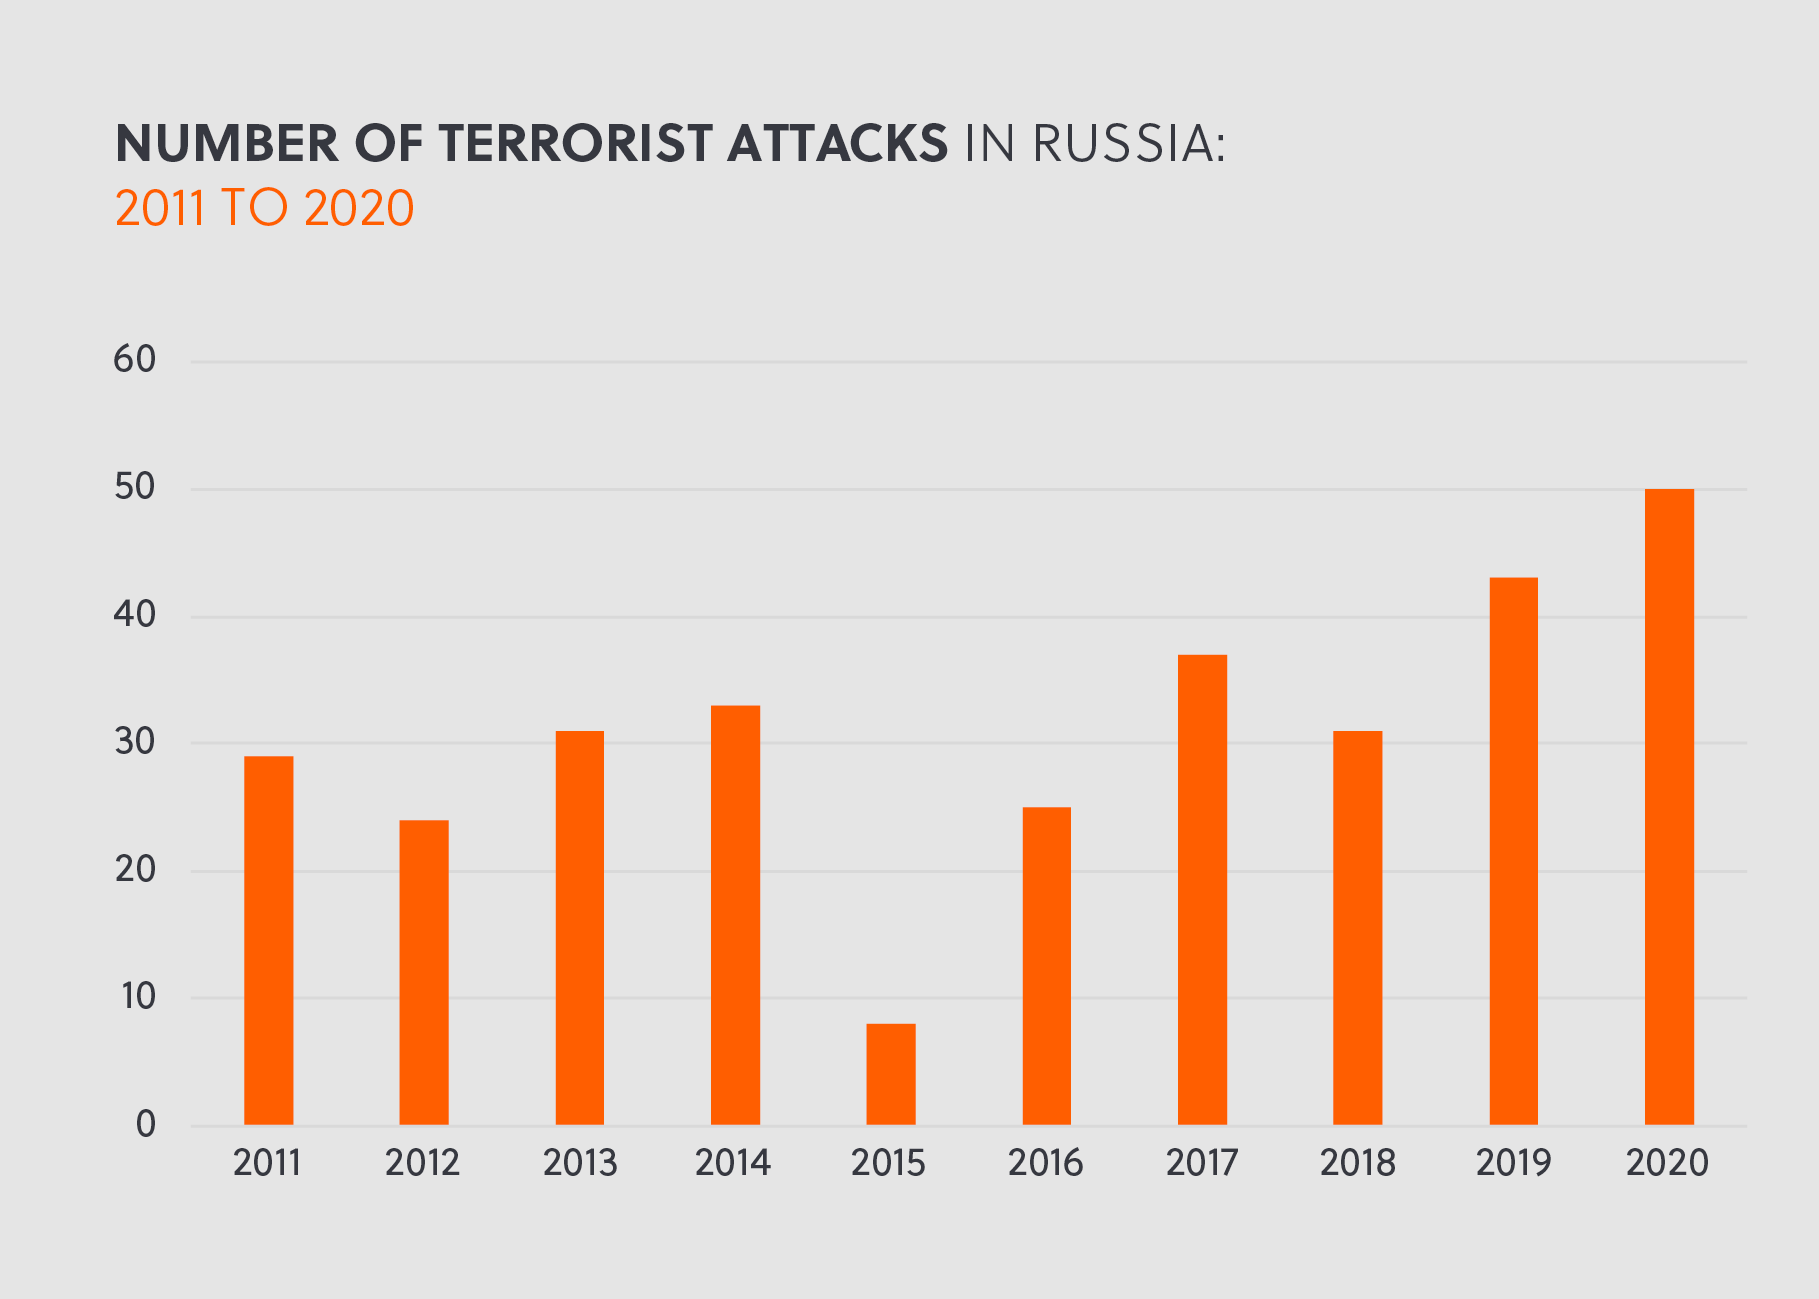 Number of Terrorist Attacks in Russia